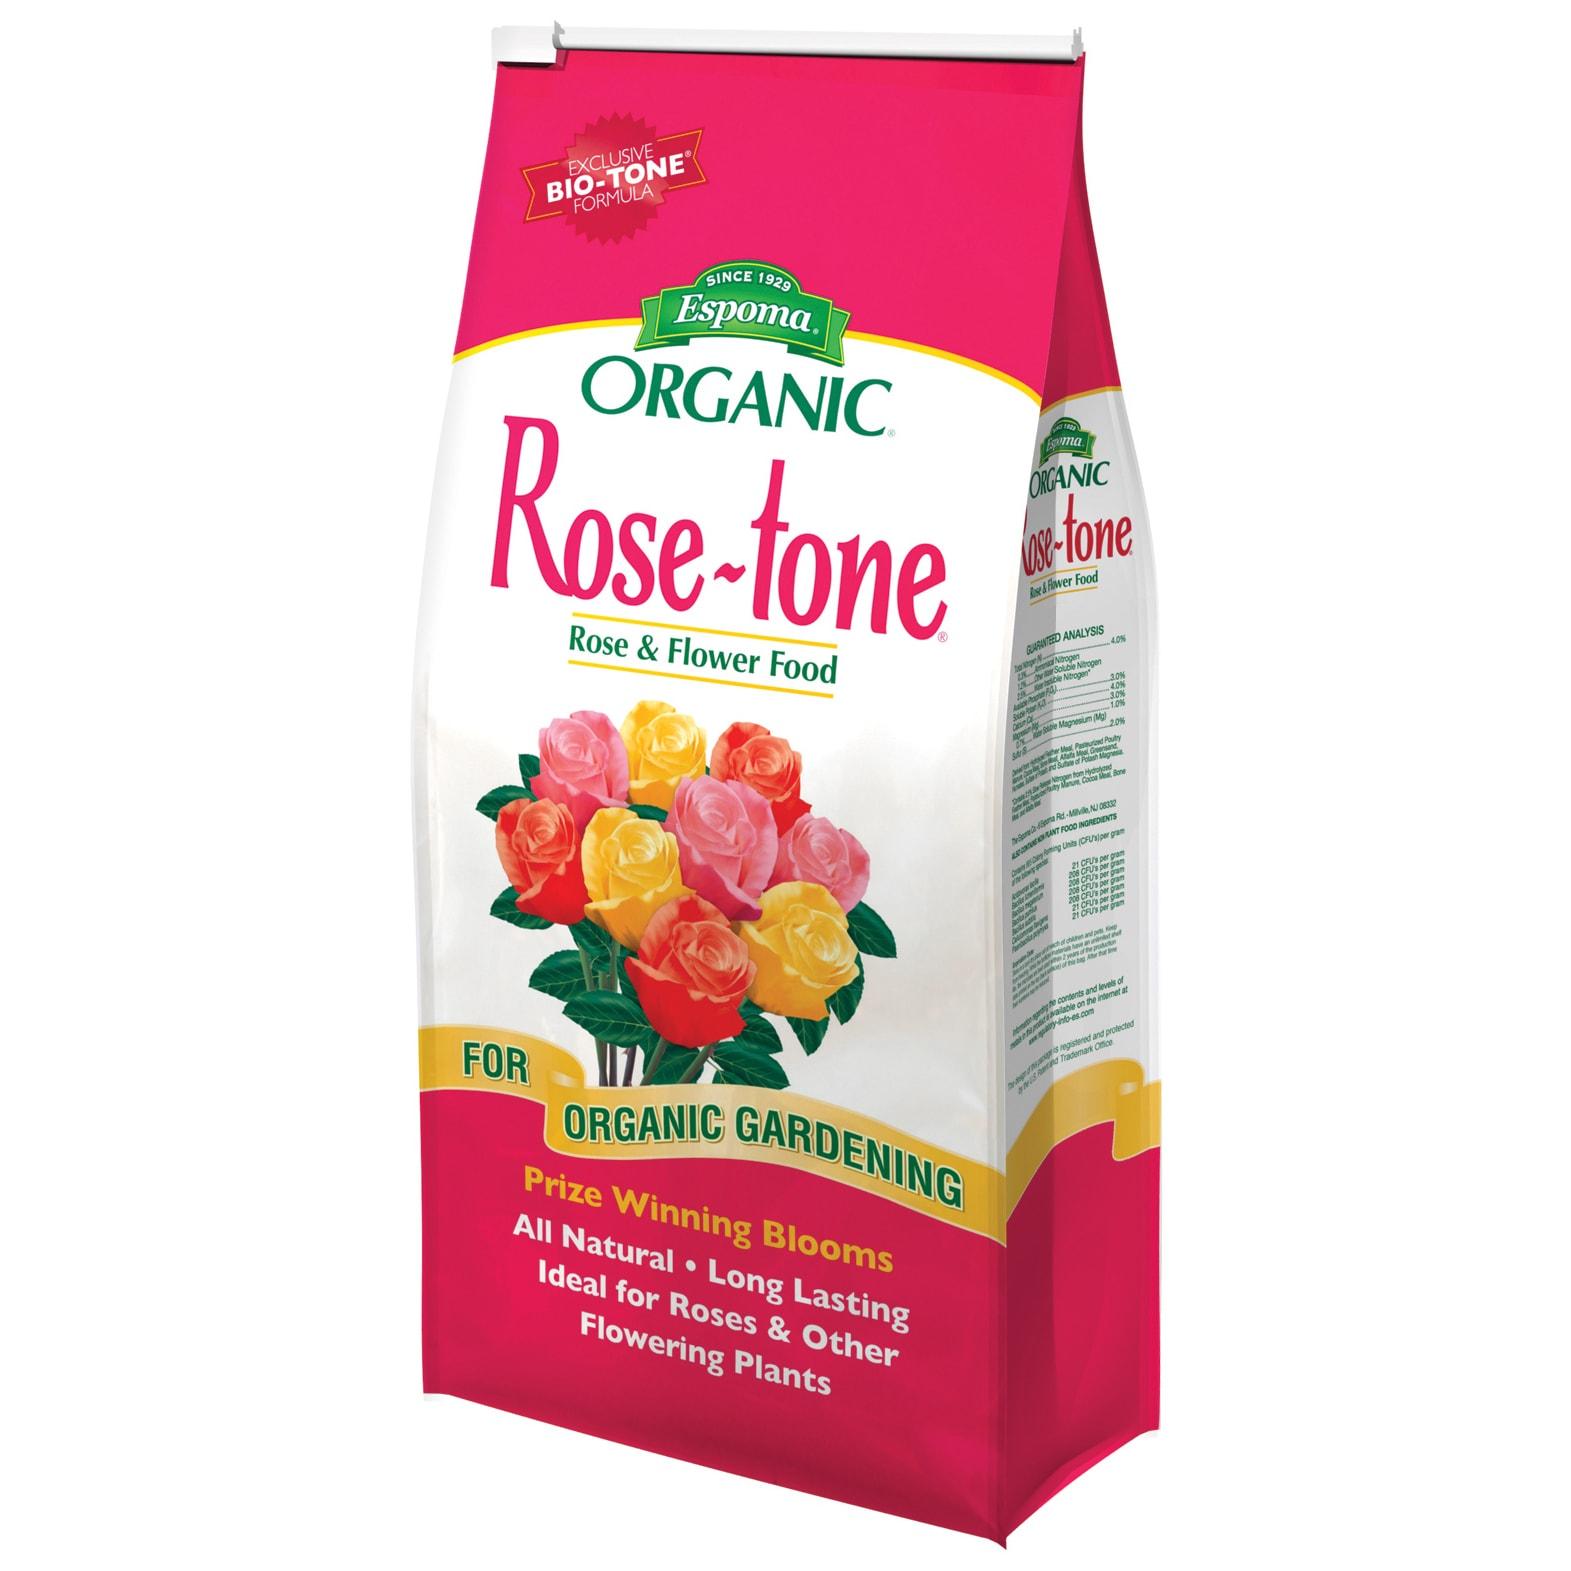 ESPOMA RT18 18-pound Rose Tone (Plant Food & Fertilizer),...